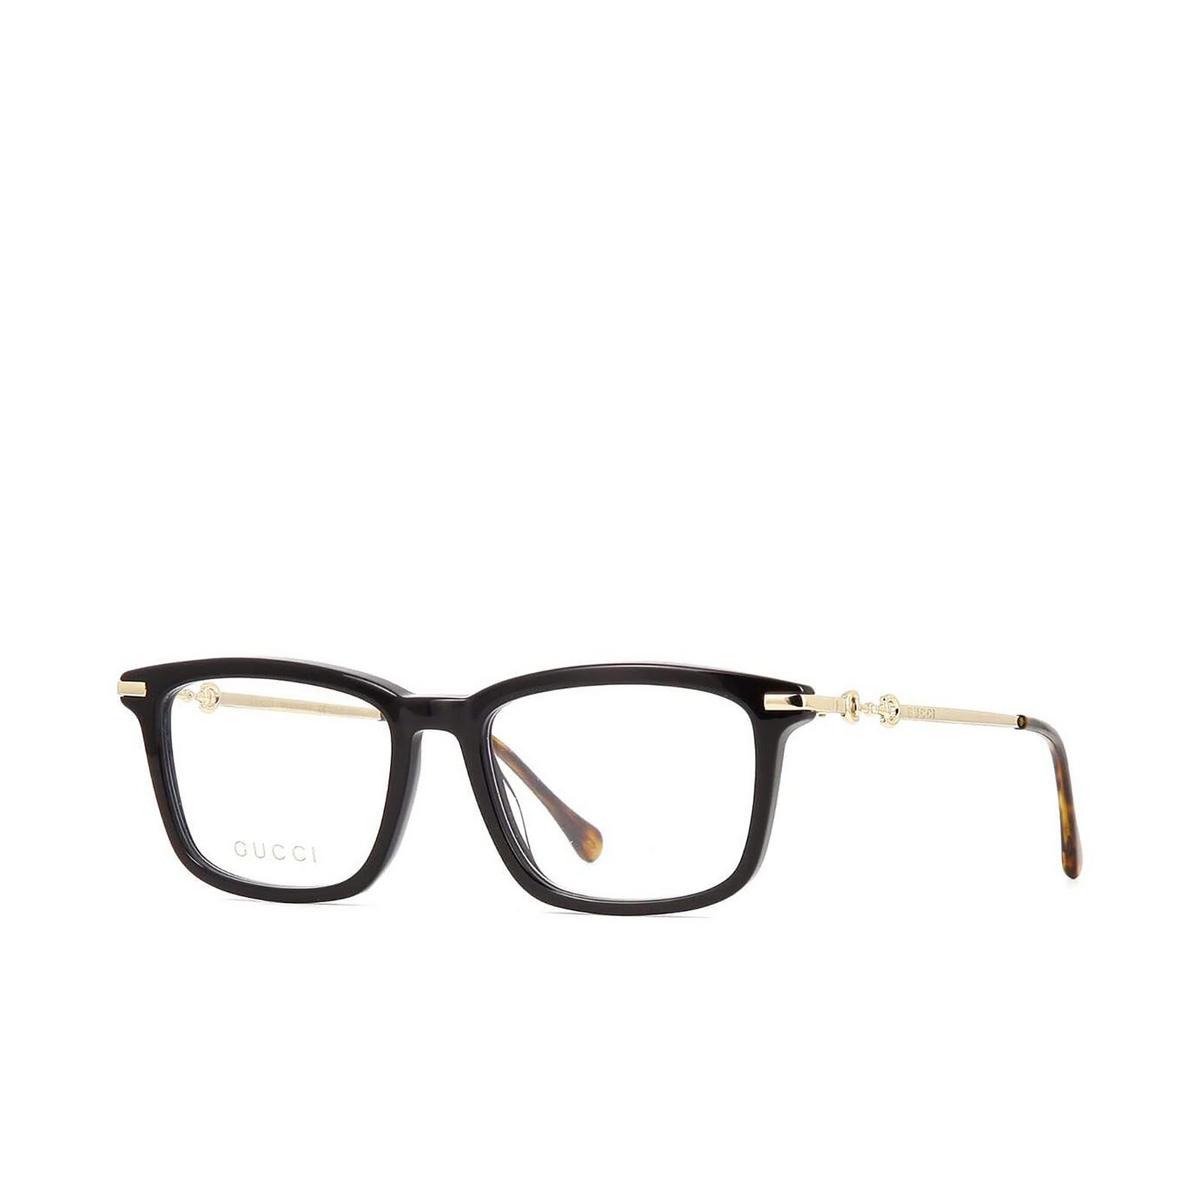 Gucci® Rectangle Eyeglasses: GG0920O color Black 004 - three-quarters view.